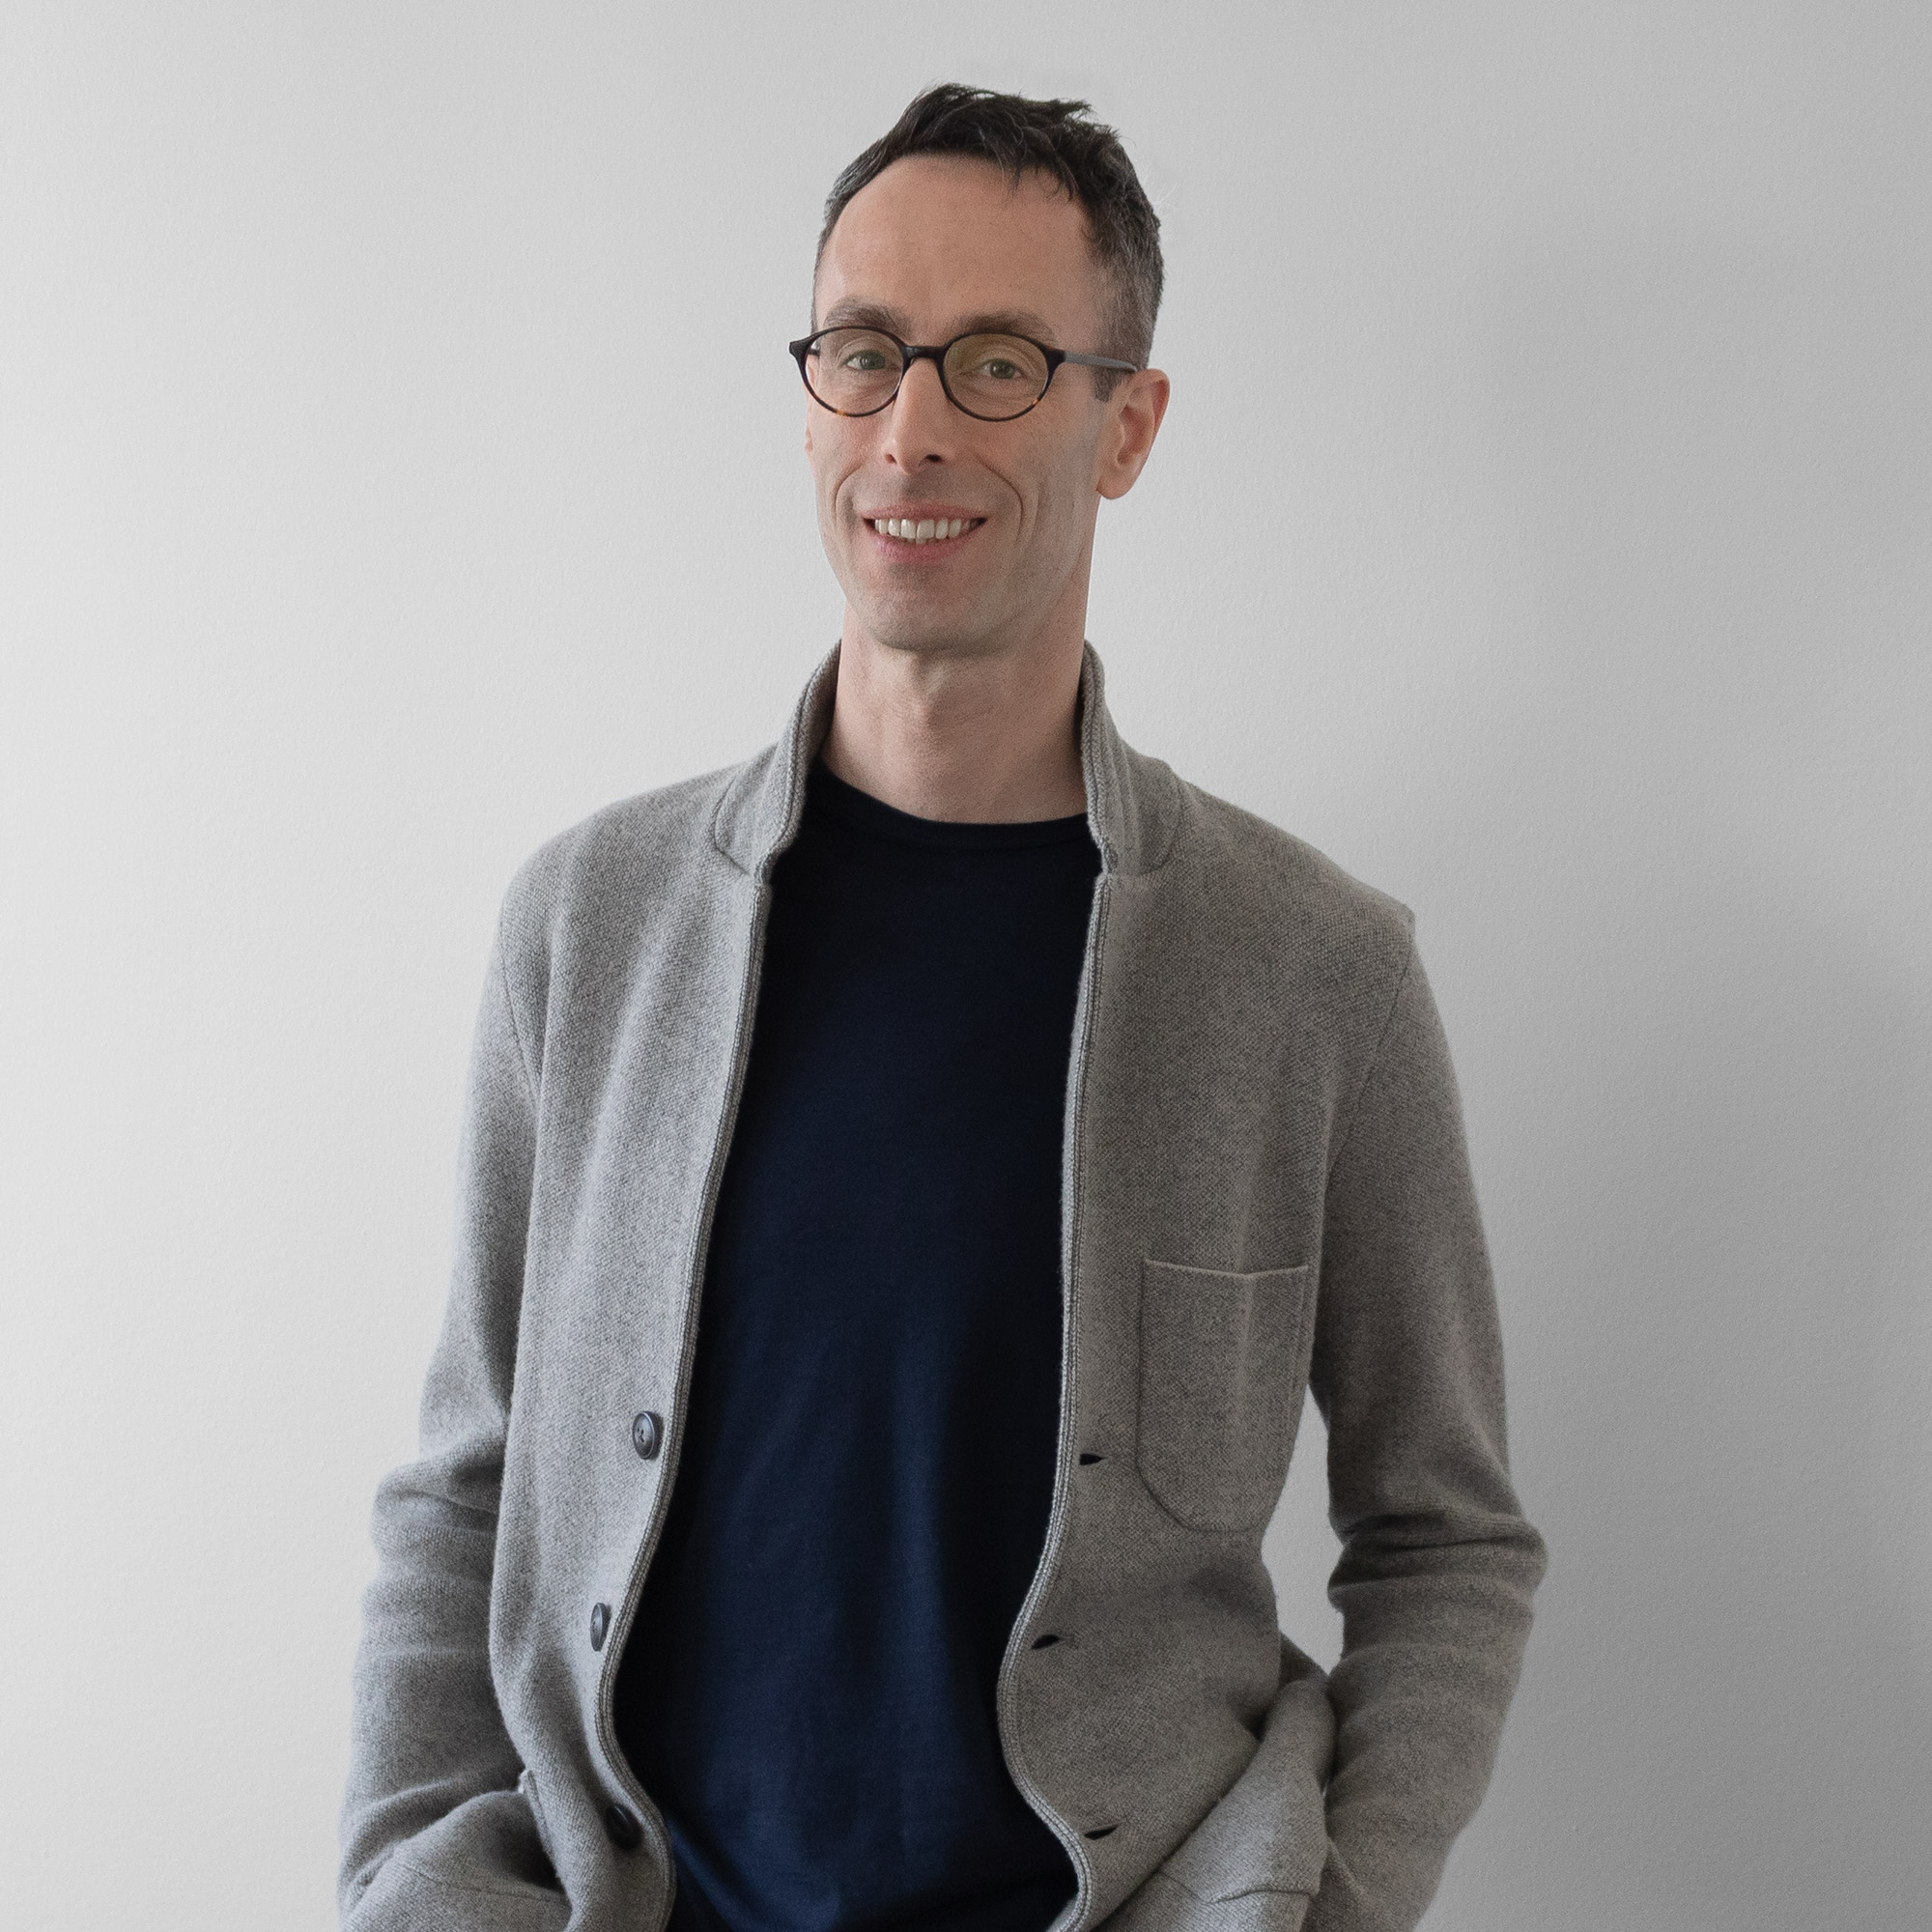 Portrait of interior designer Dan Hazeldean